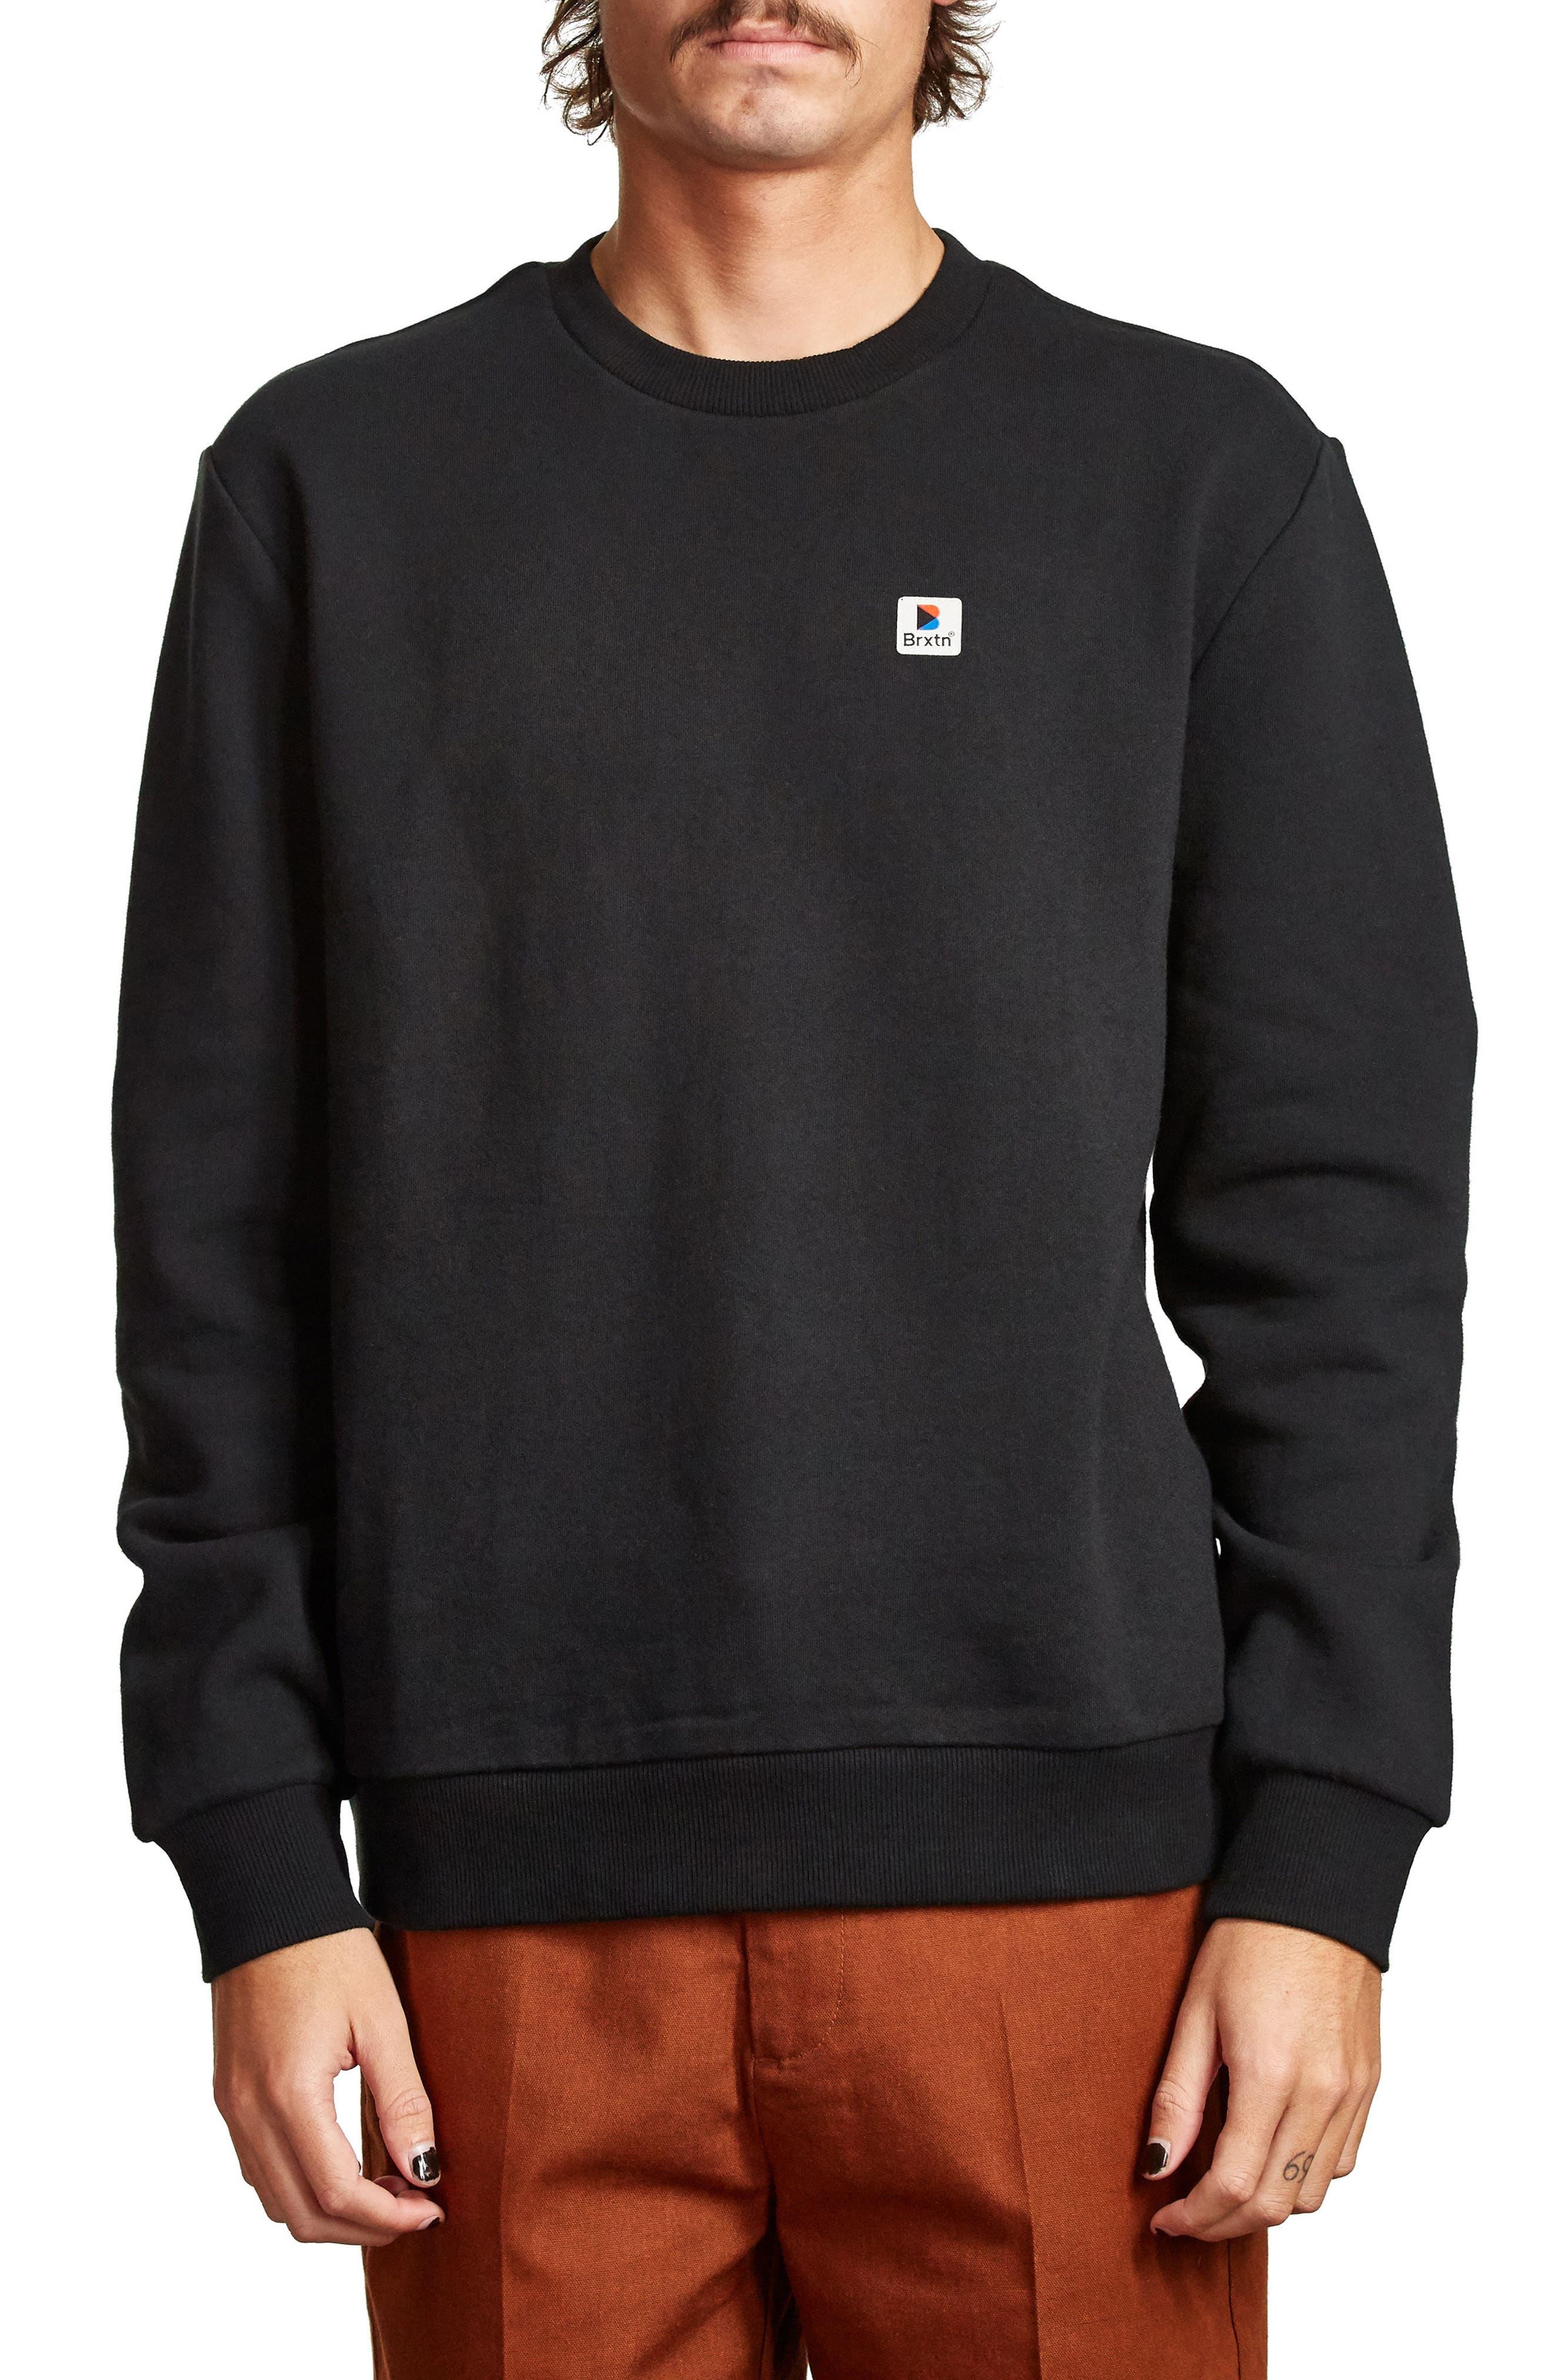 Stonewell Sweatshirt,                         Main,                         color, Black